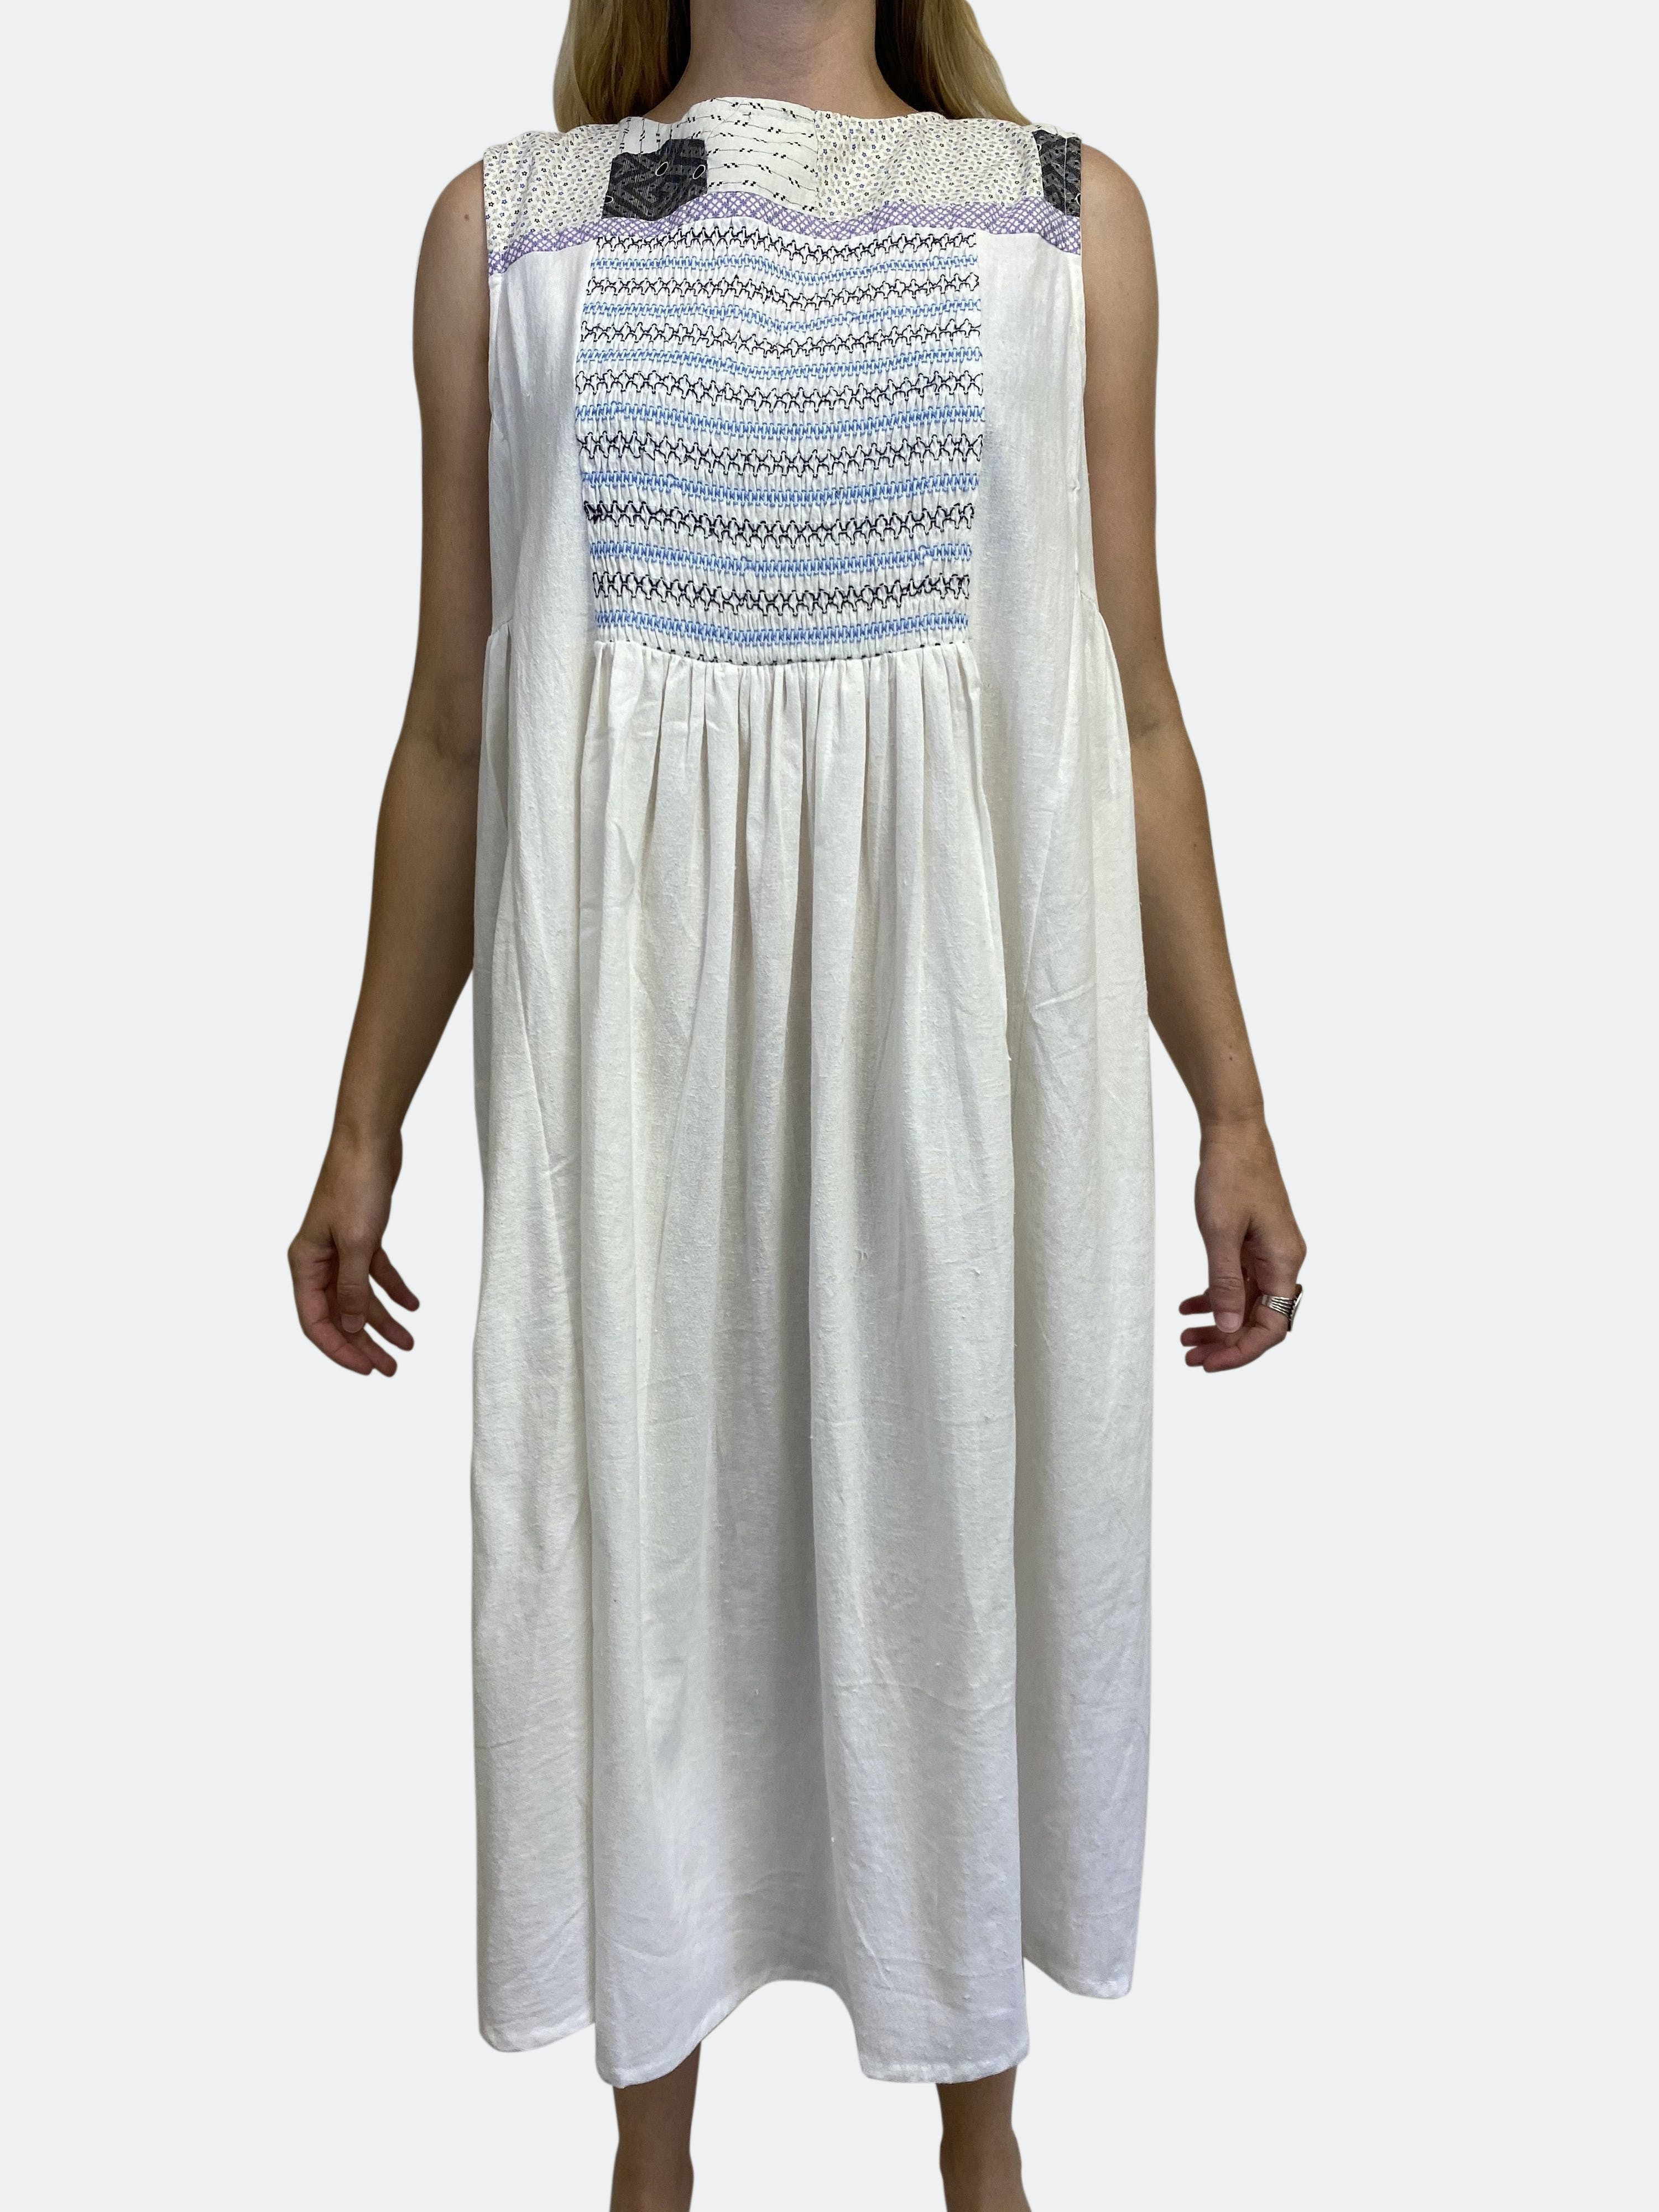 Farewell Frances Georgie Dress L/xl In Blue